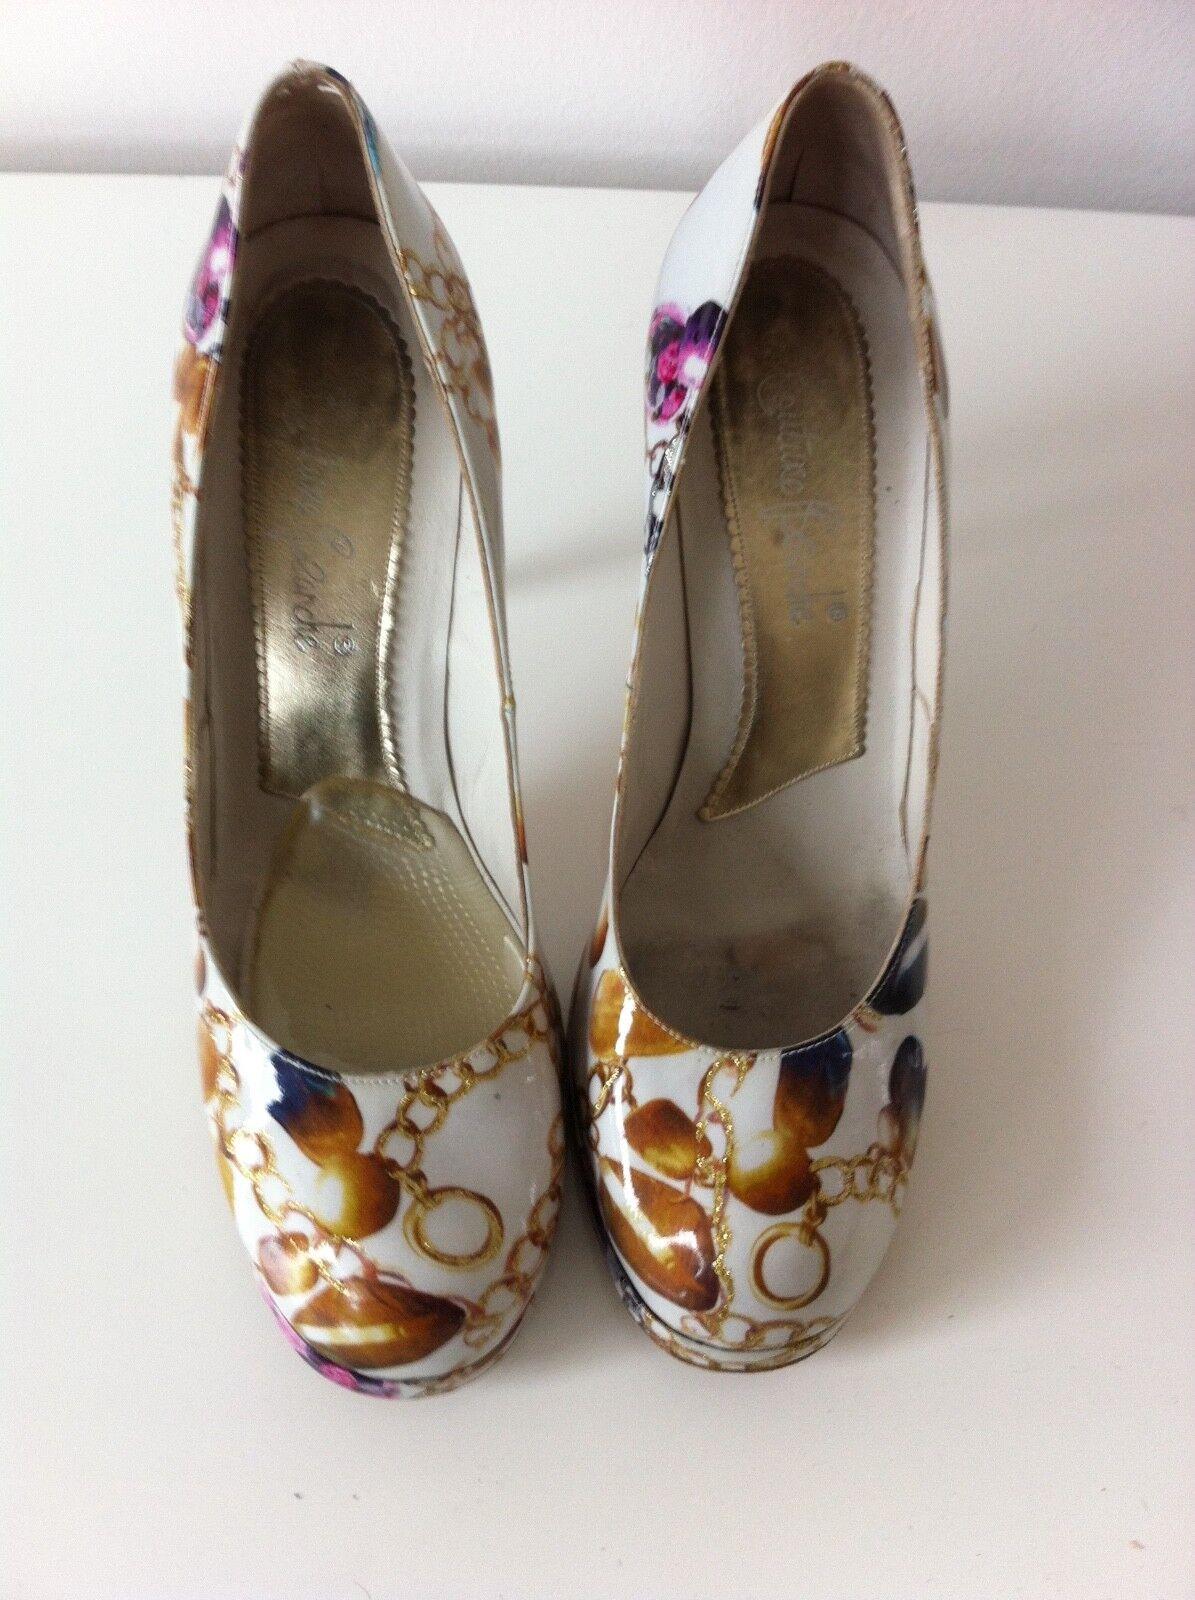 Damen high heels + clutch   Couture Beanche     Ledersohle Gr. 40   zus. 50 Euro ed7de6